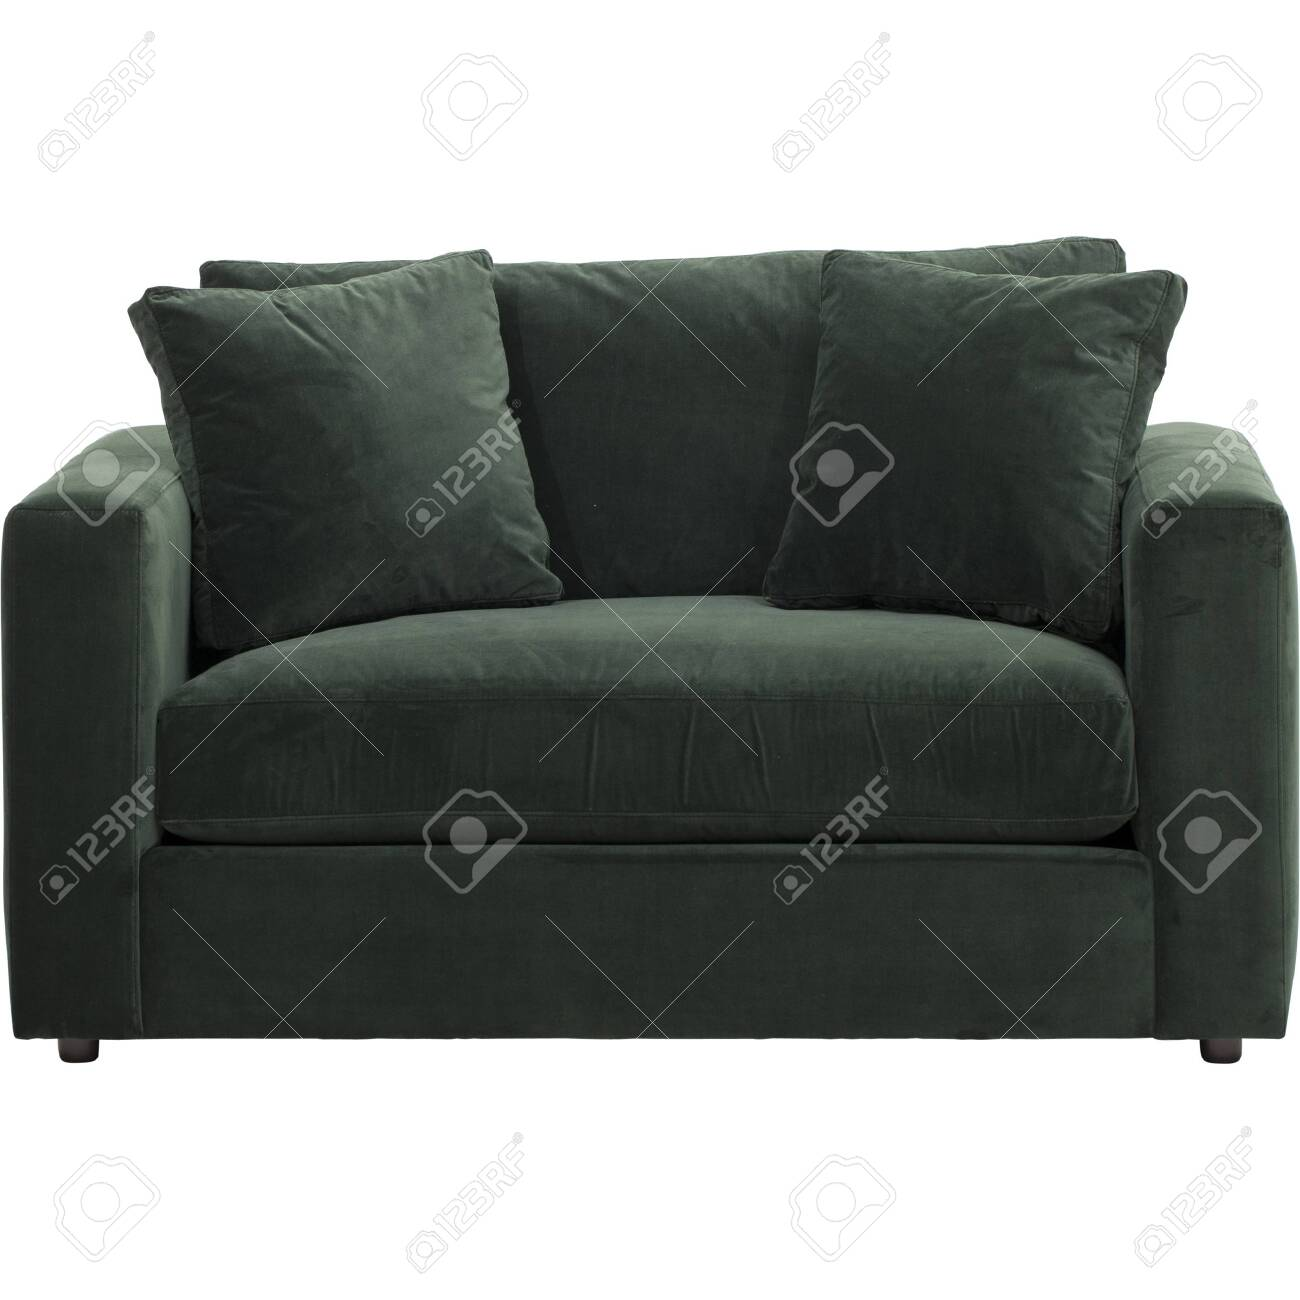 Balsam green velvet sofa, Slipcover Stretchable Pure Color Sofa..